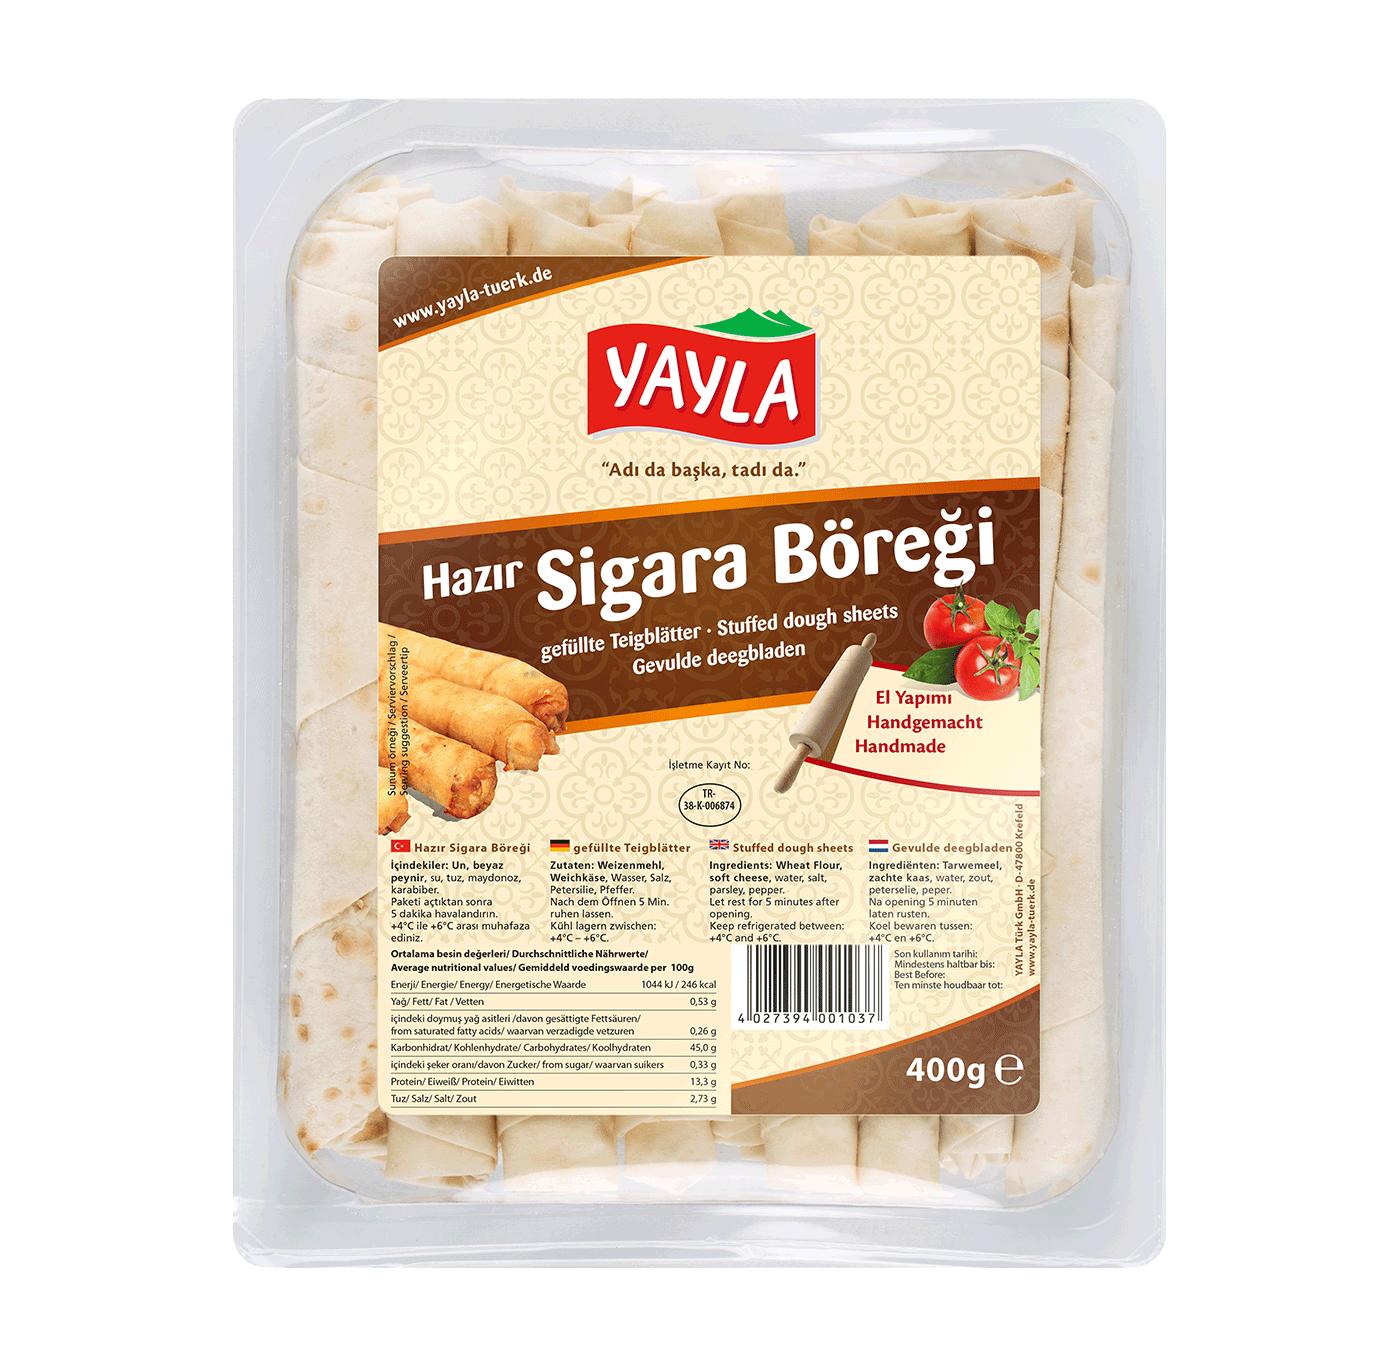 Yayla hazir Sigara Böregi / Teigblätter mit Käse 400g